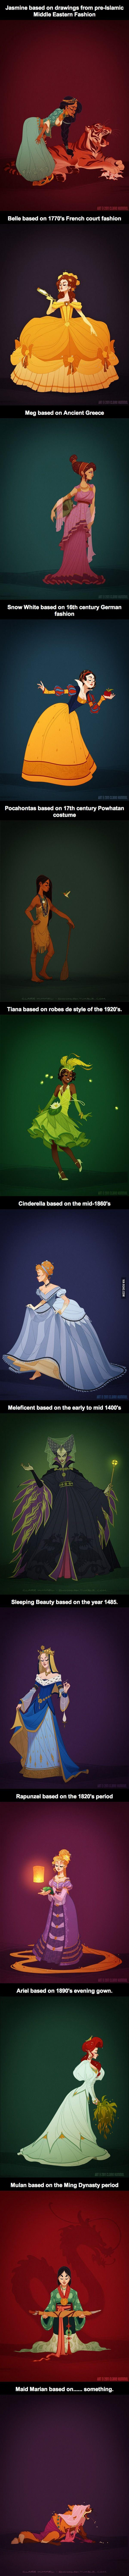 Disney Princesses Based on Historical Period Fashion